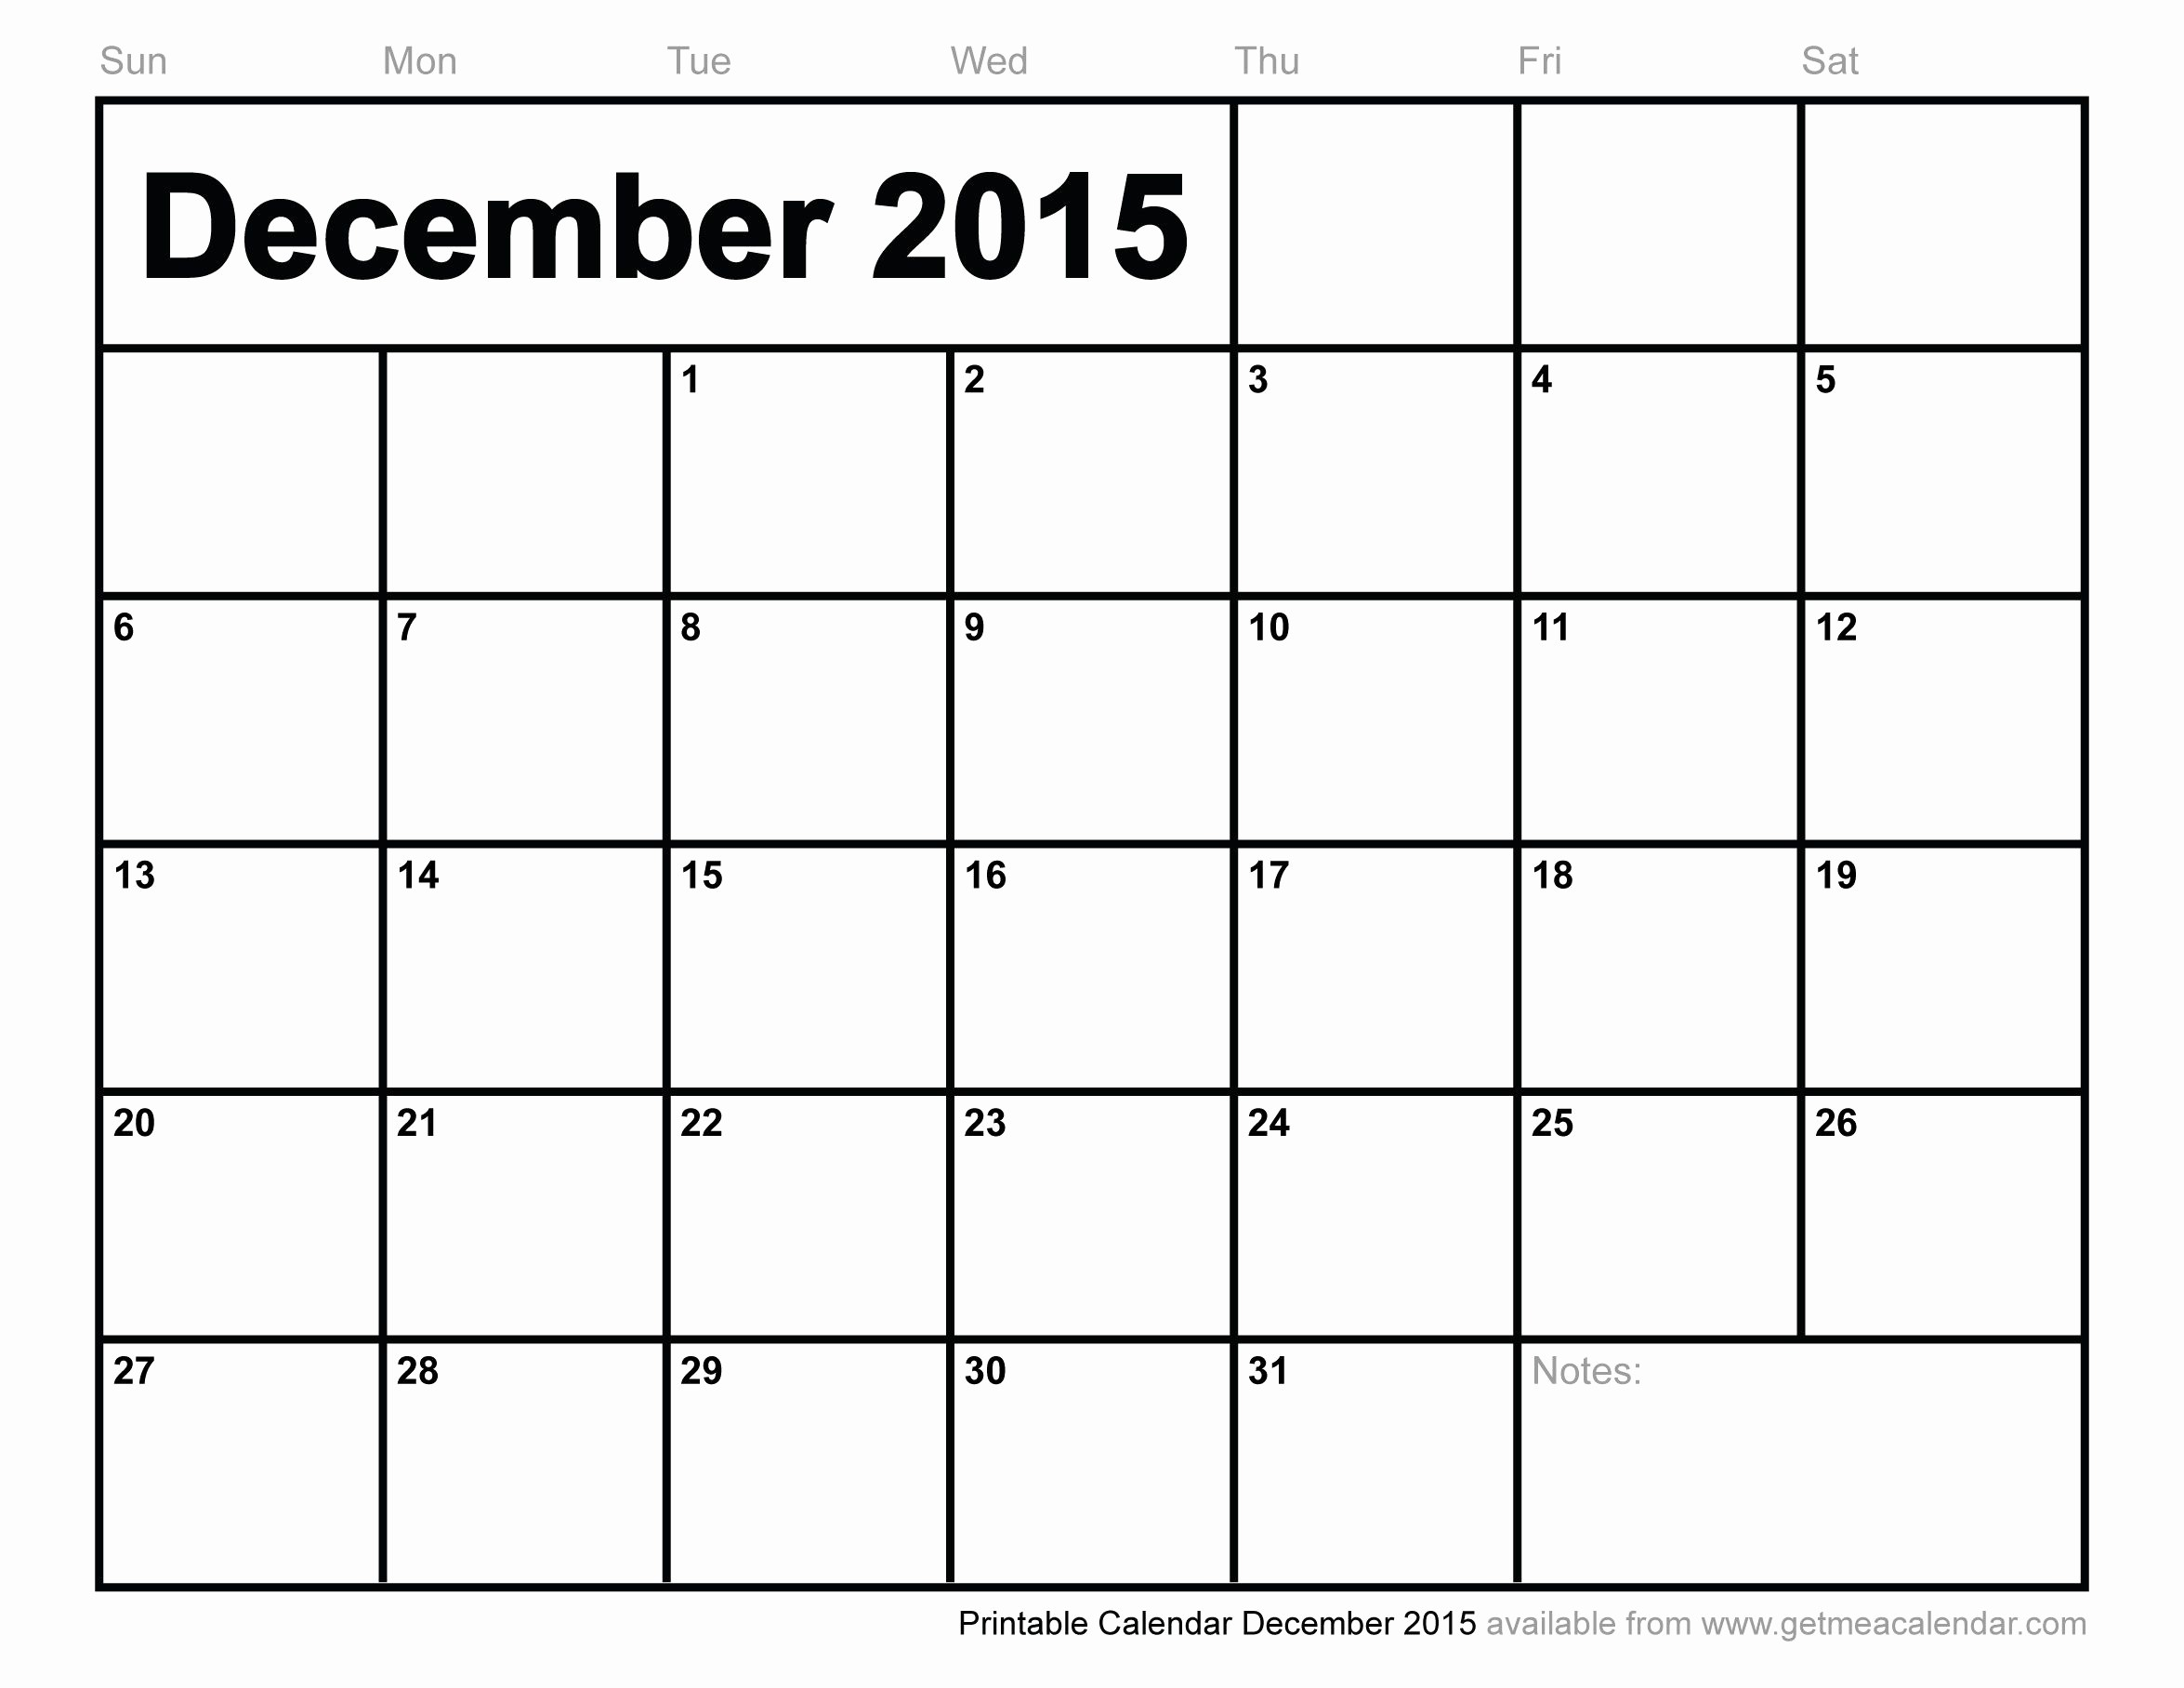 December 2015 Calendar Word Document Inspirational December 2015 Printable Calendar